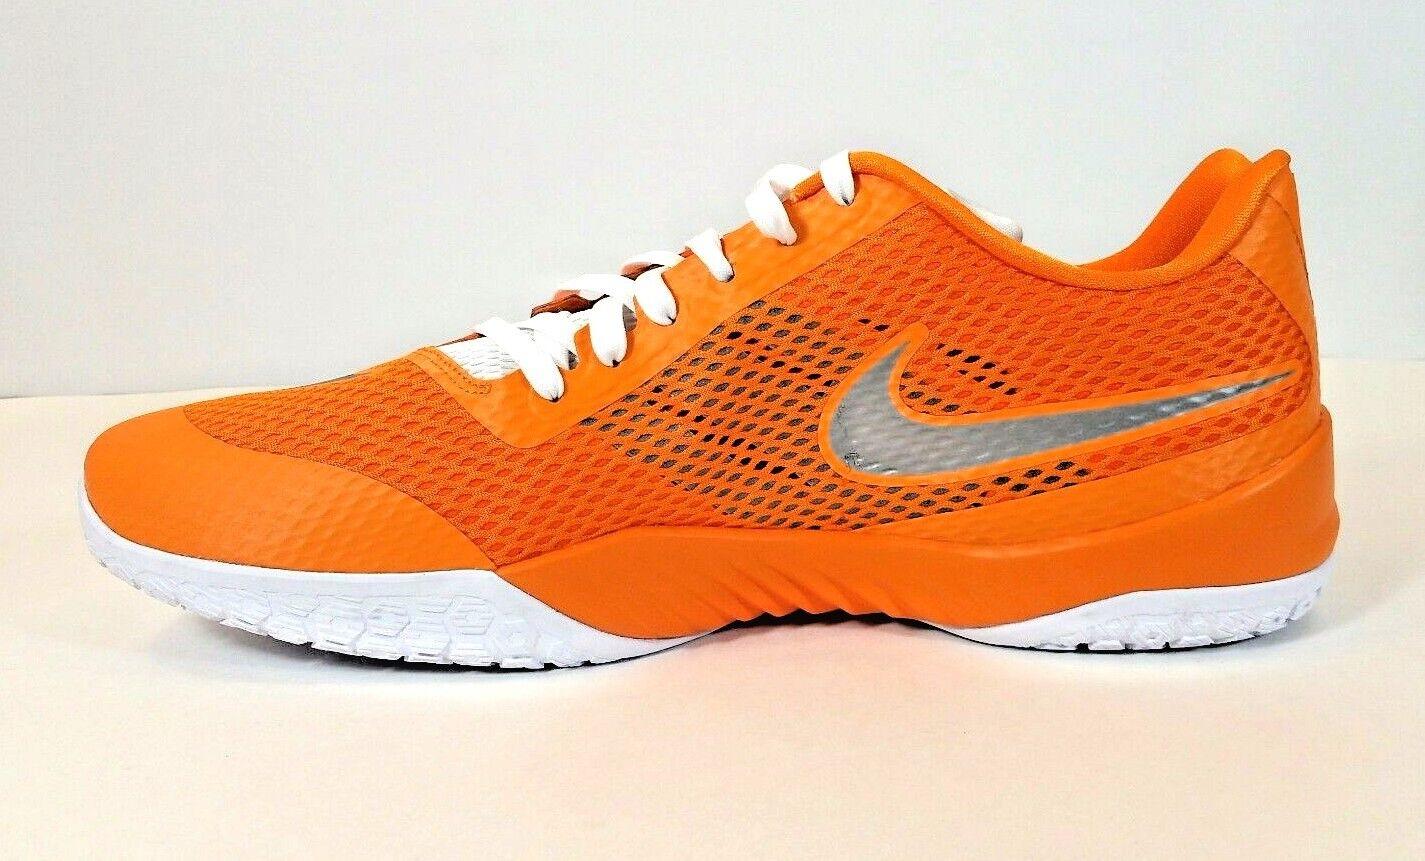 separation shoes b046d 9225b ... Nike Hyper Live Basketball Low Sneakers Orange Sz 18 18 18 c7541c